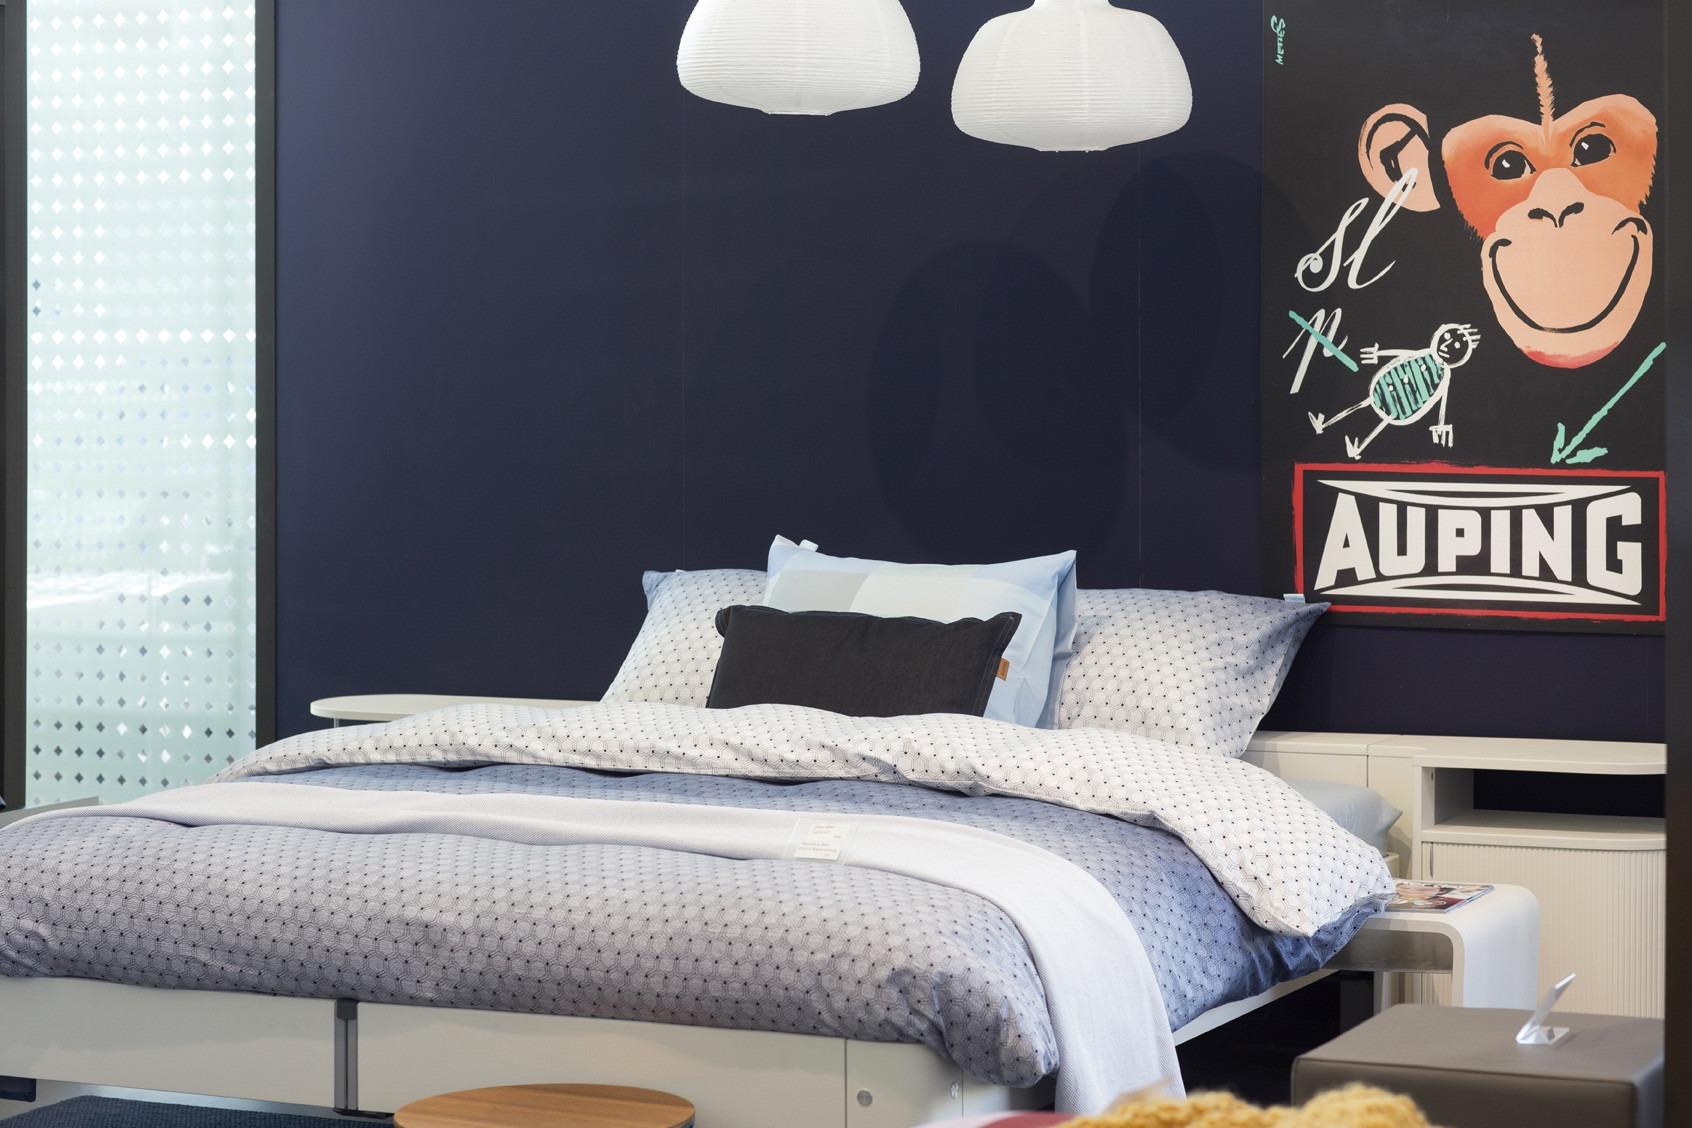 Beste Auping Matras.Auping Matras Aanbieding 300lyp Trendy In Onze Showroom In Soest